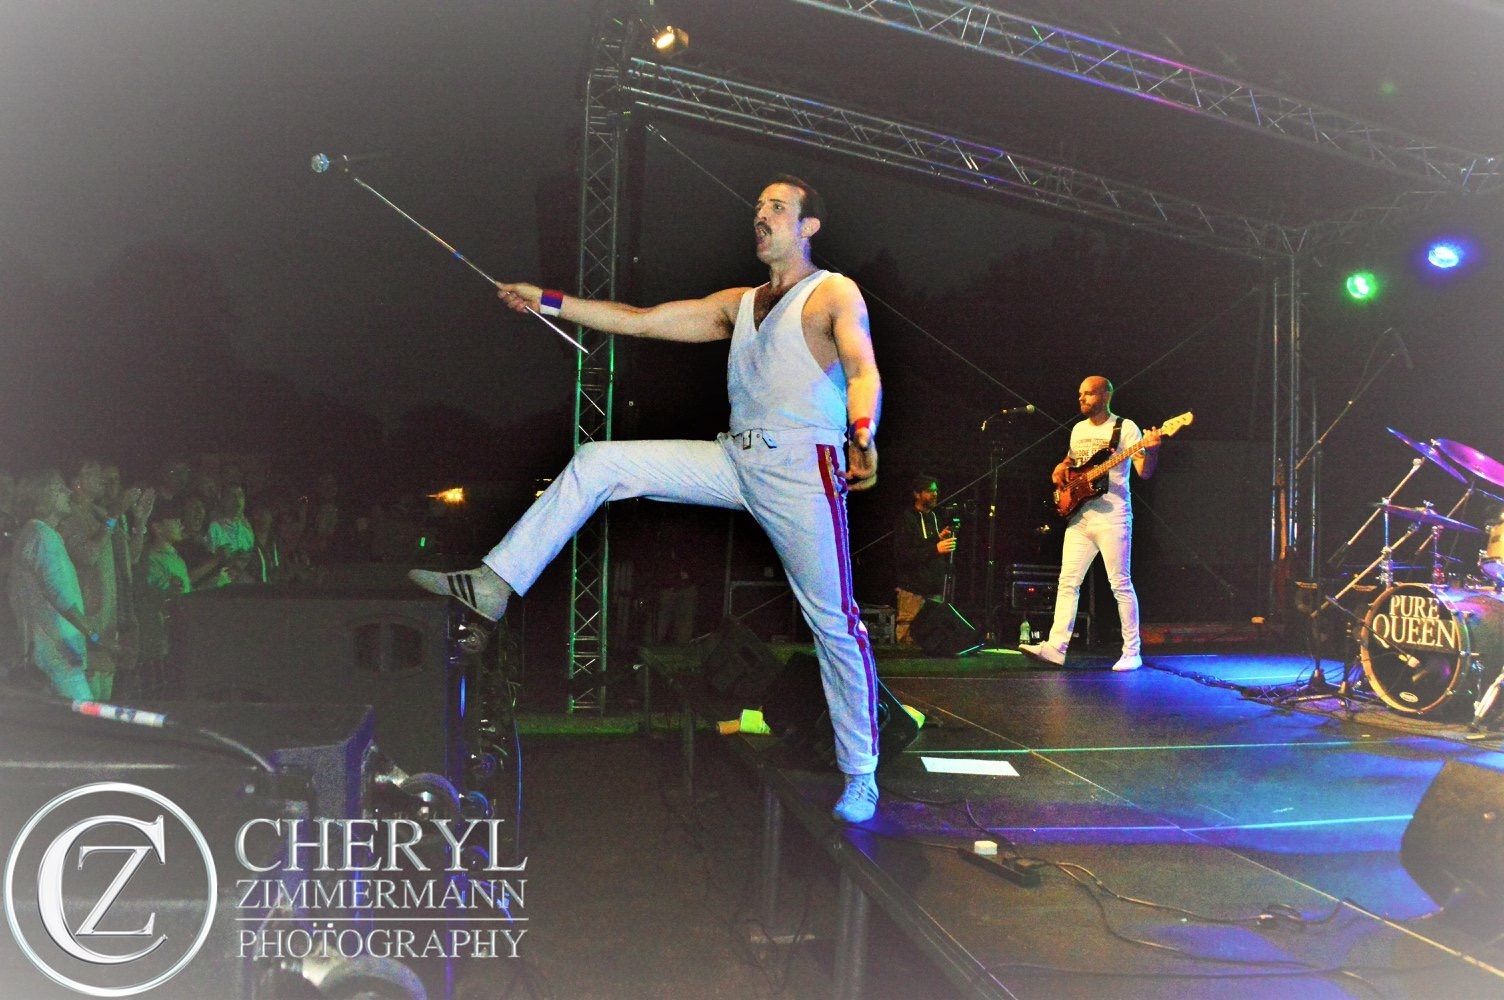 Queen live in concert - Pure Queen Tribute Band